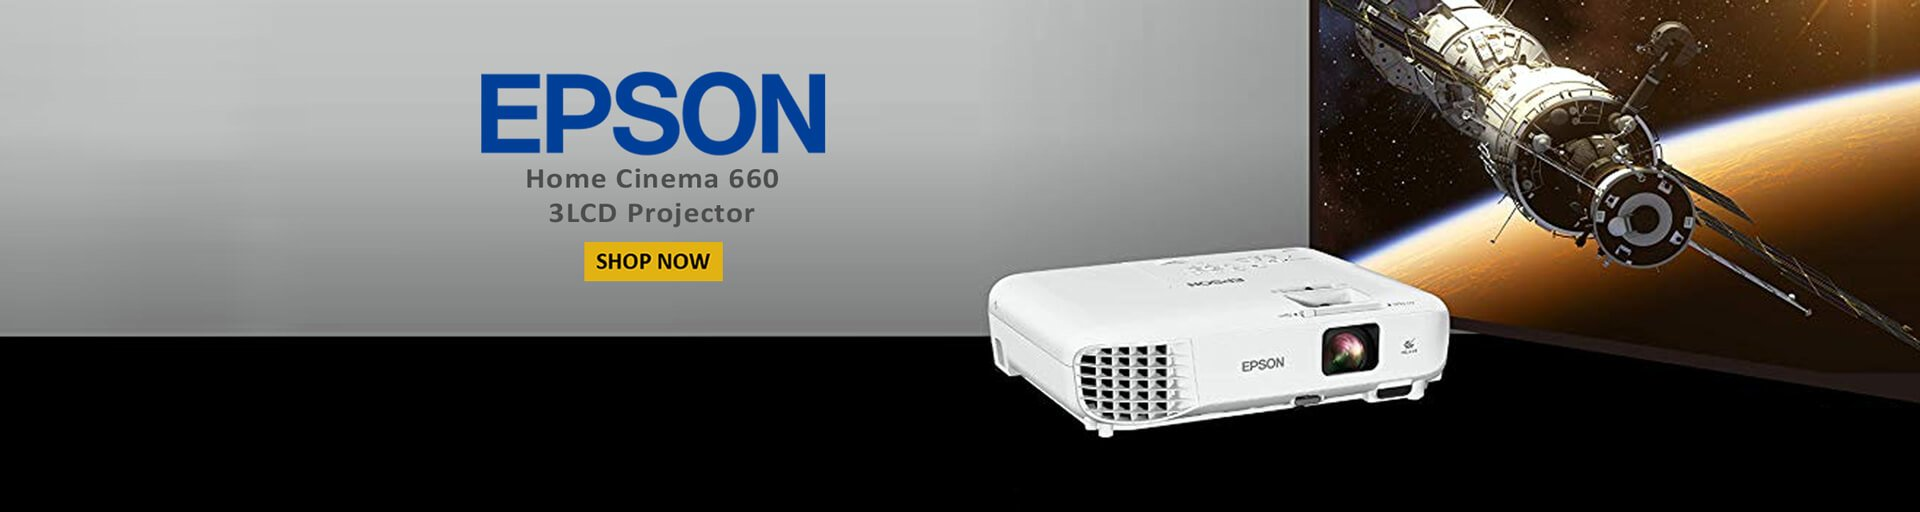 Epson-home cinema 660 3lcd projector